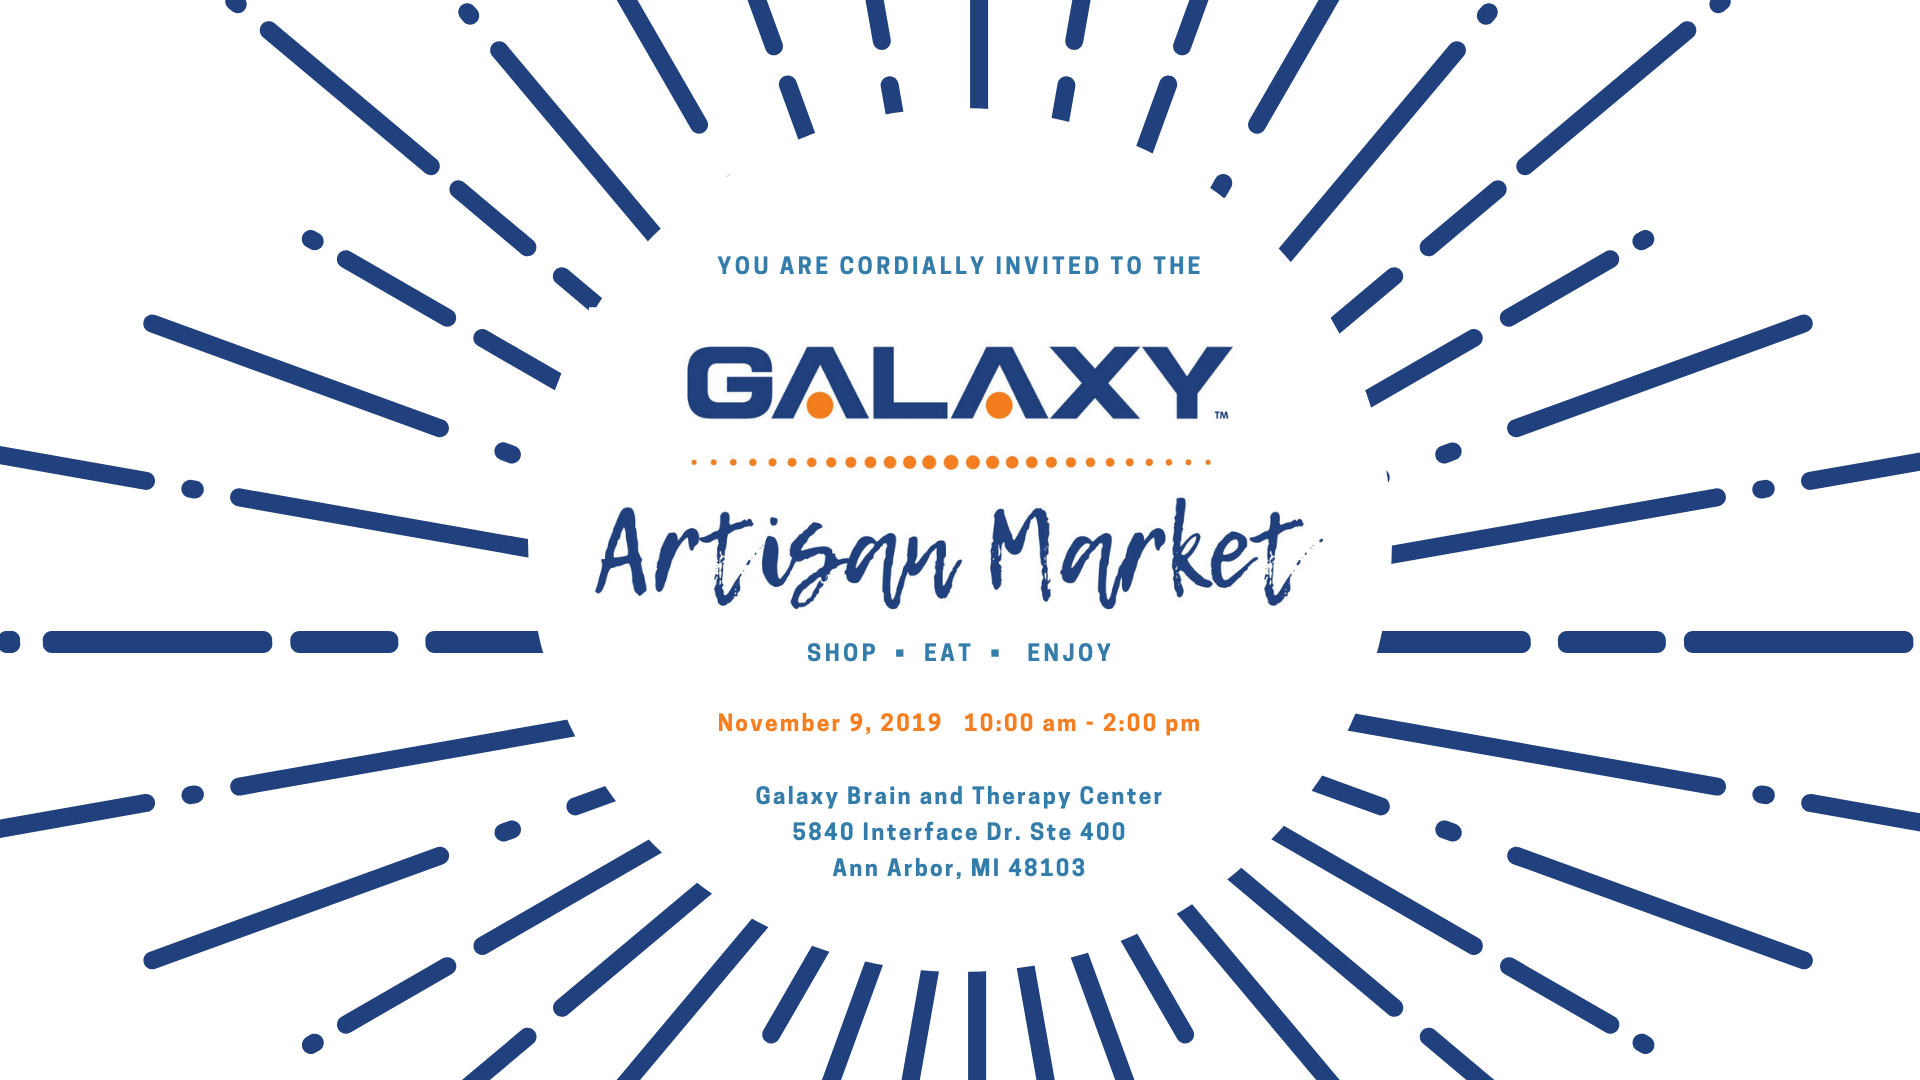 Galaxy Artisan Market